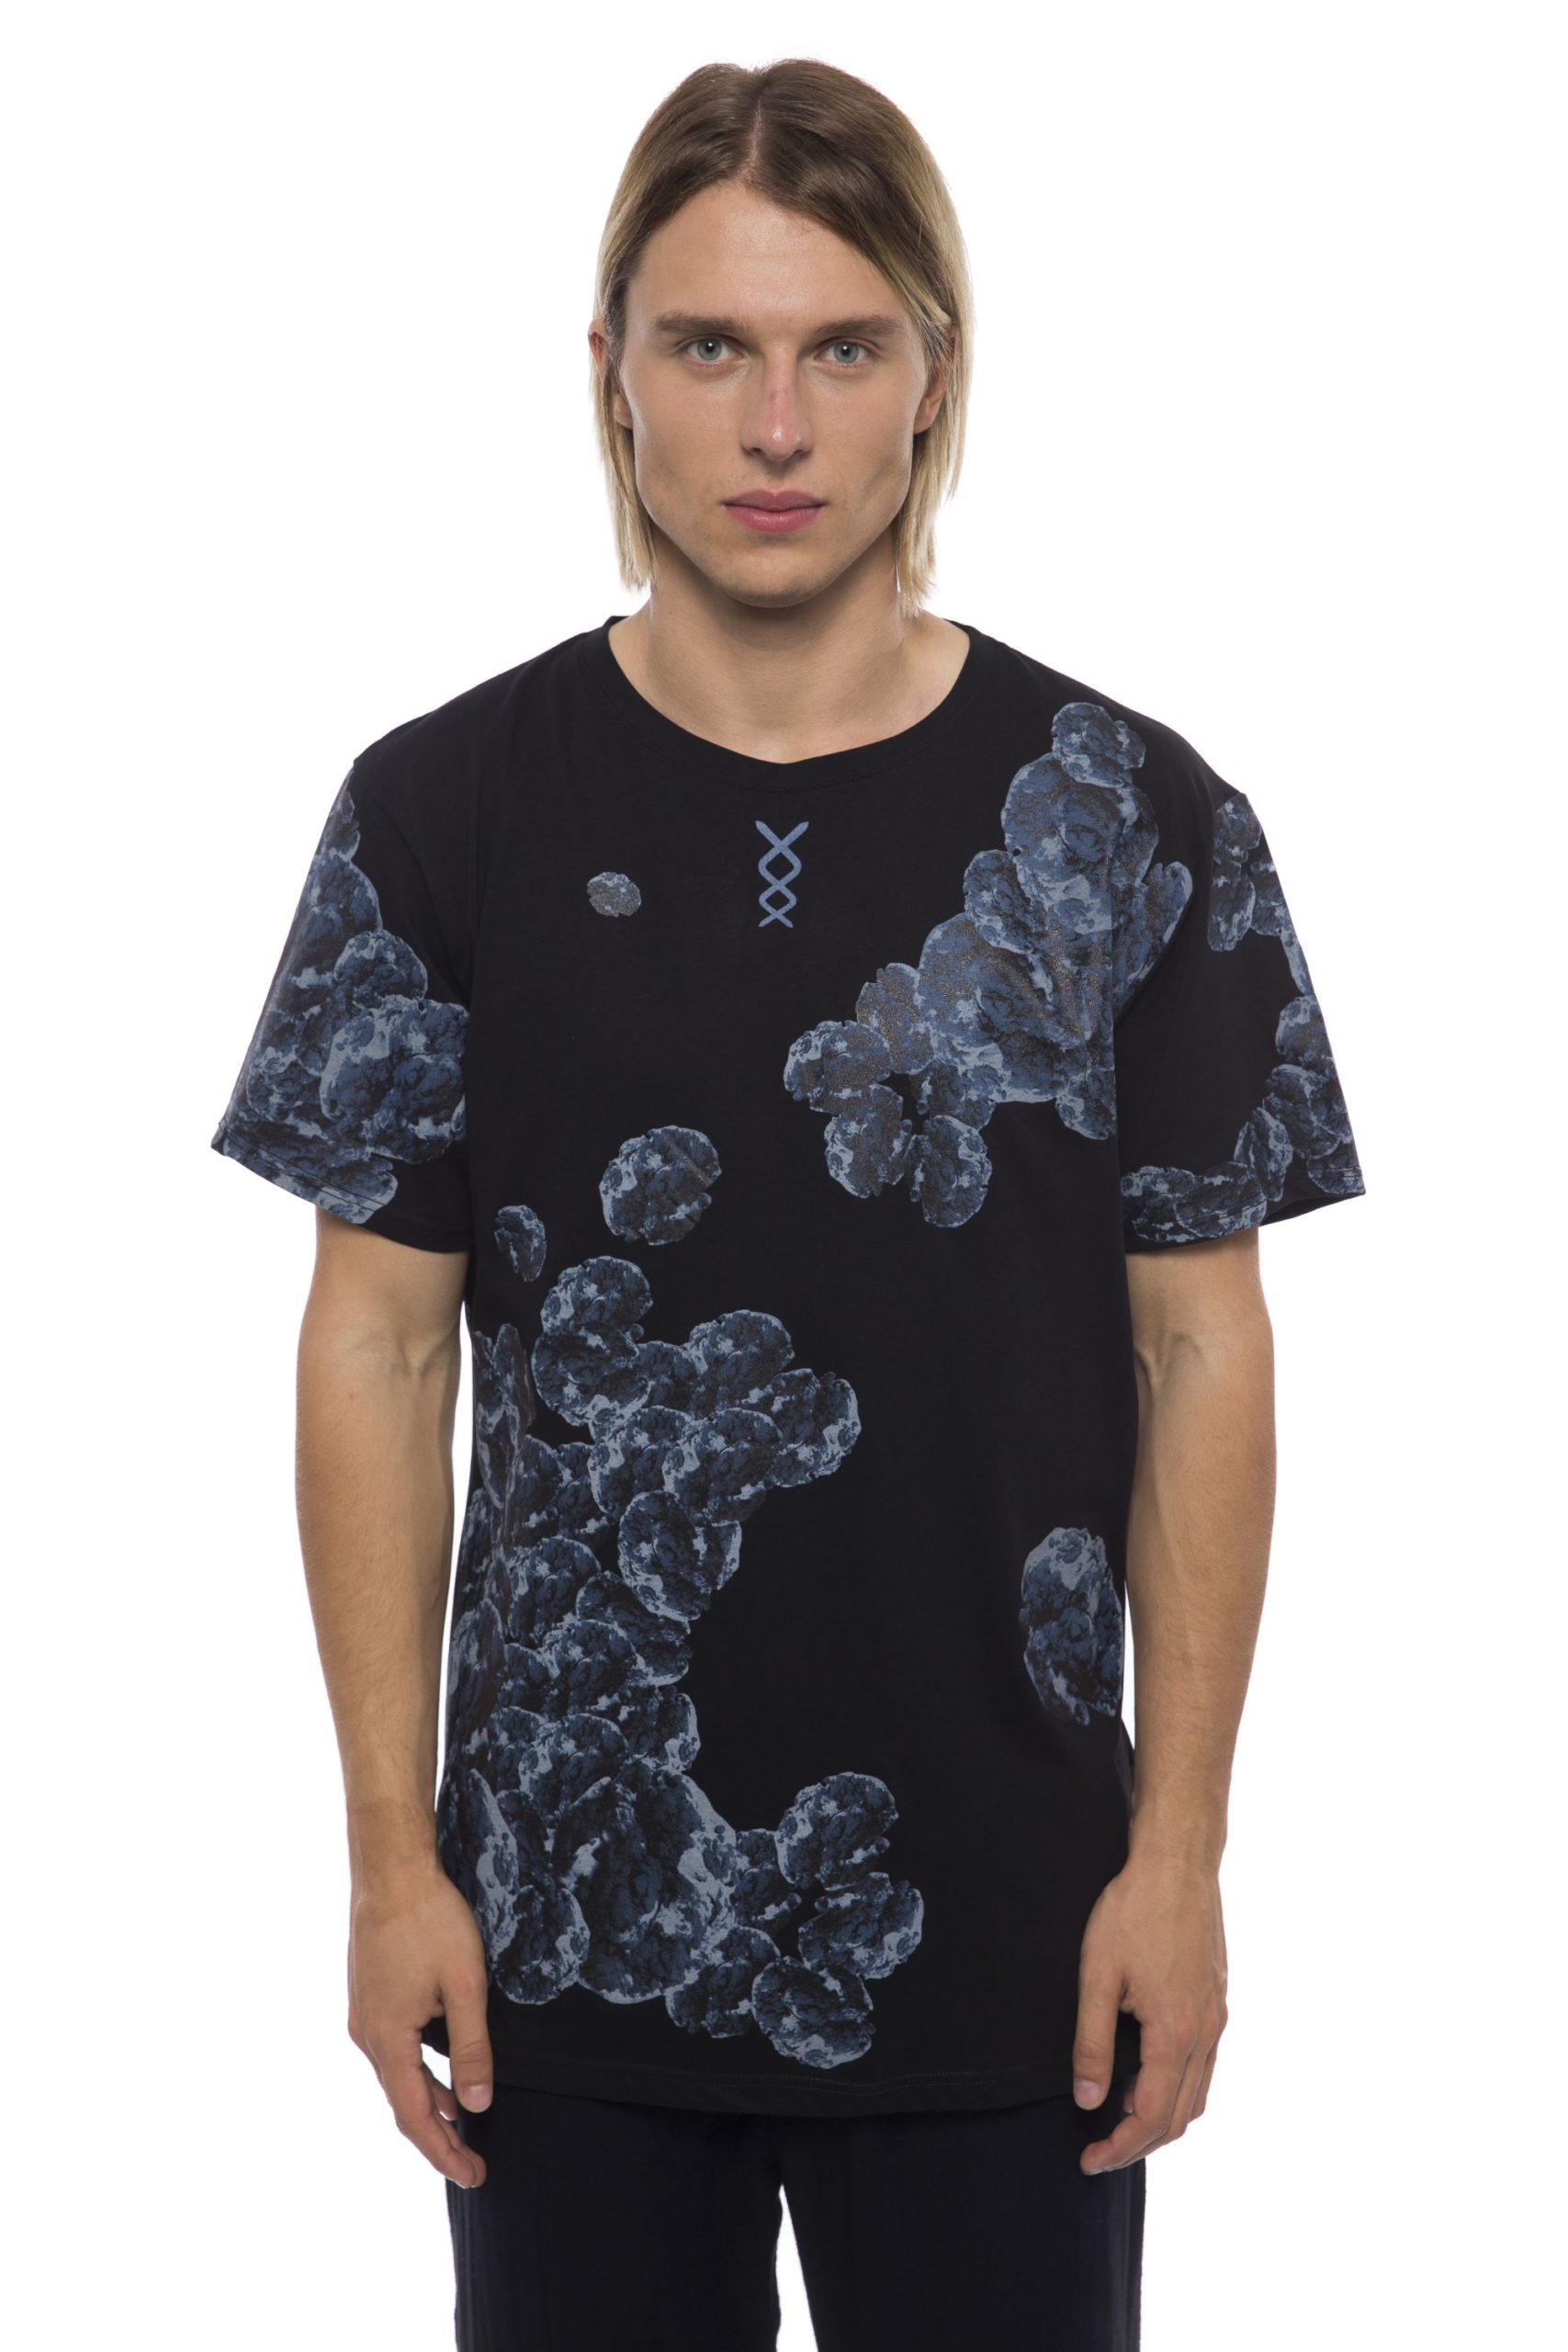 Nicolo Tonetto Men's Nero T-Shirt Black NI680171 - XL